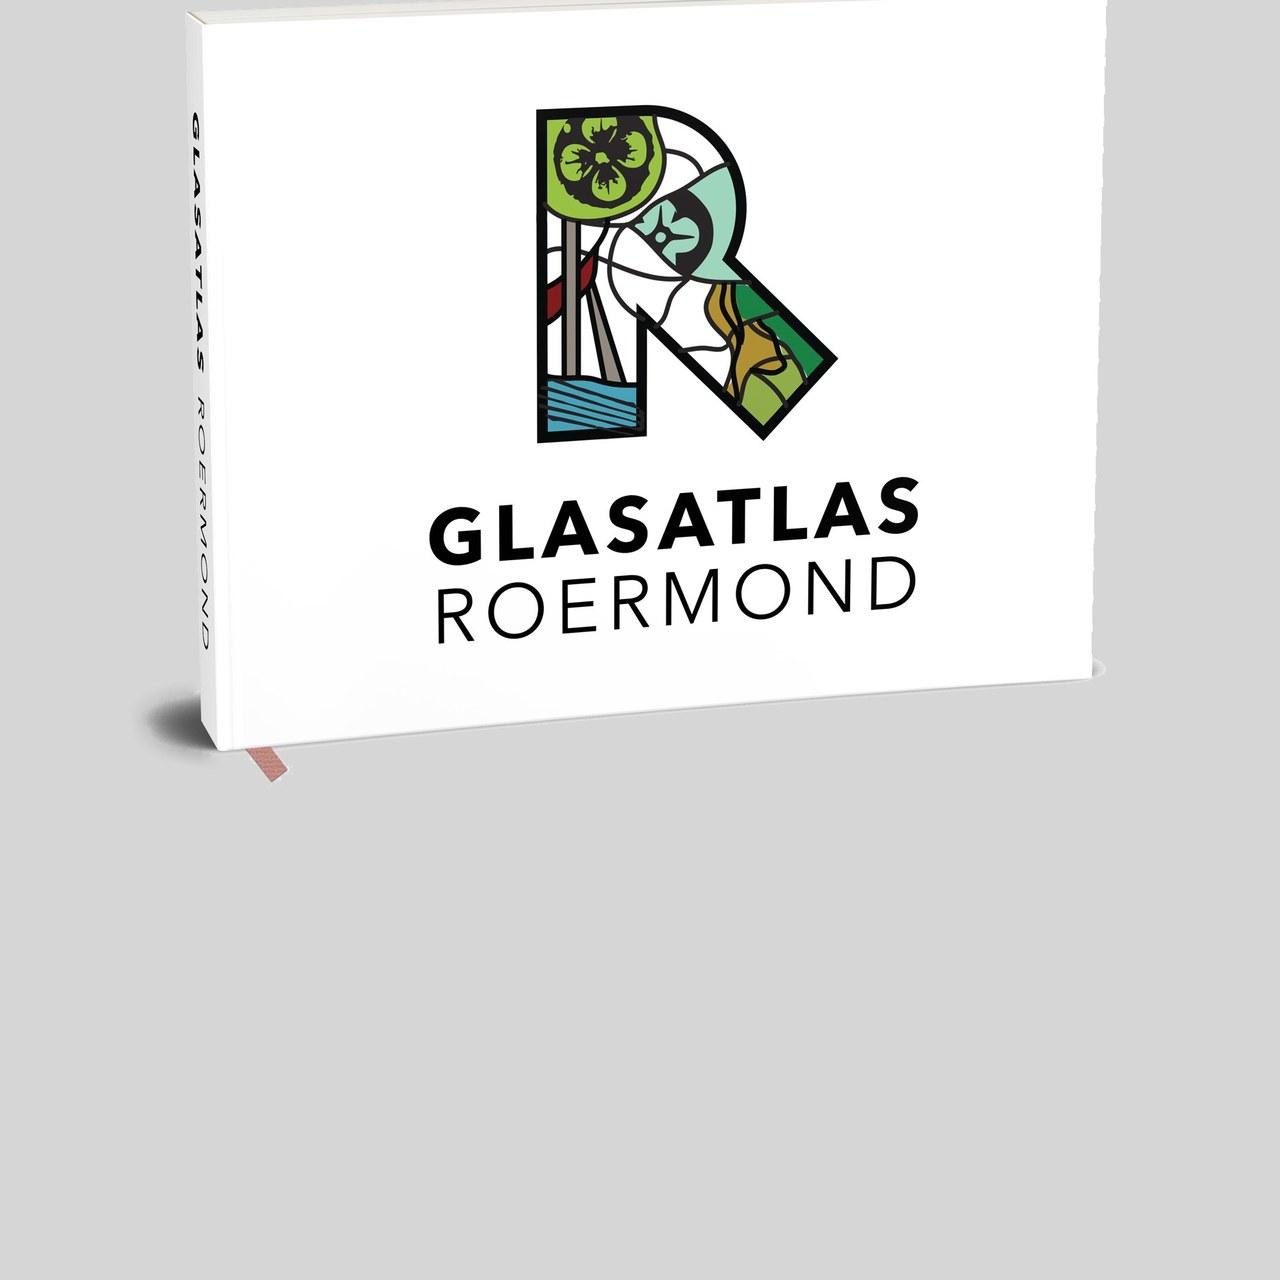 glasatlas-roermond.jpg